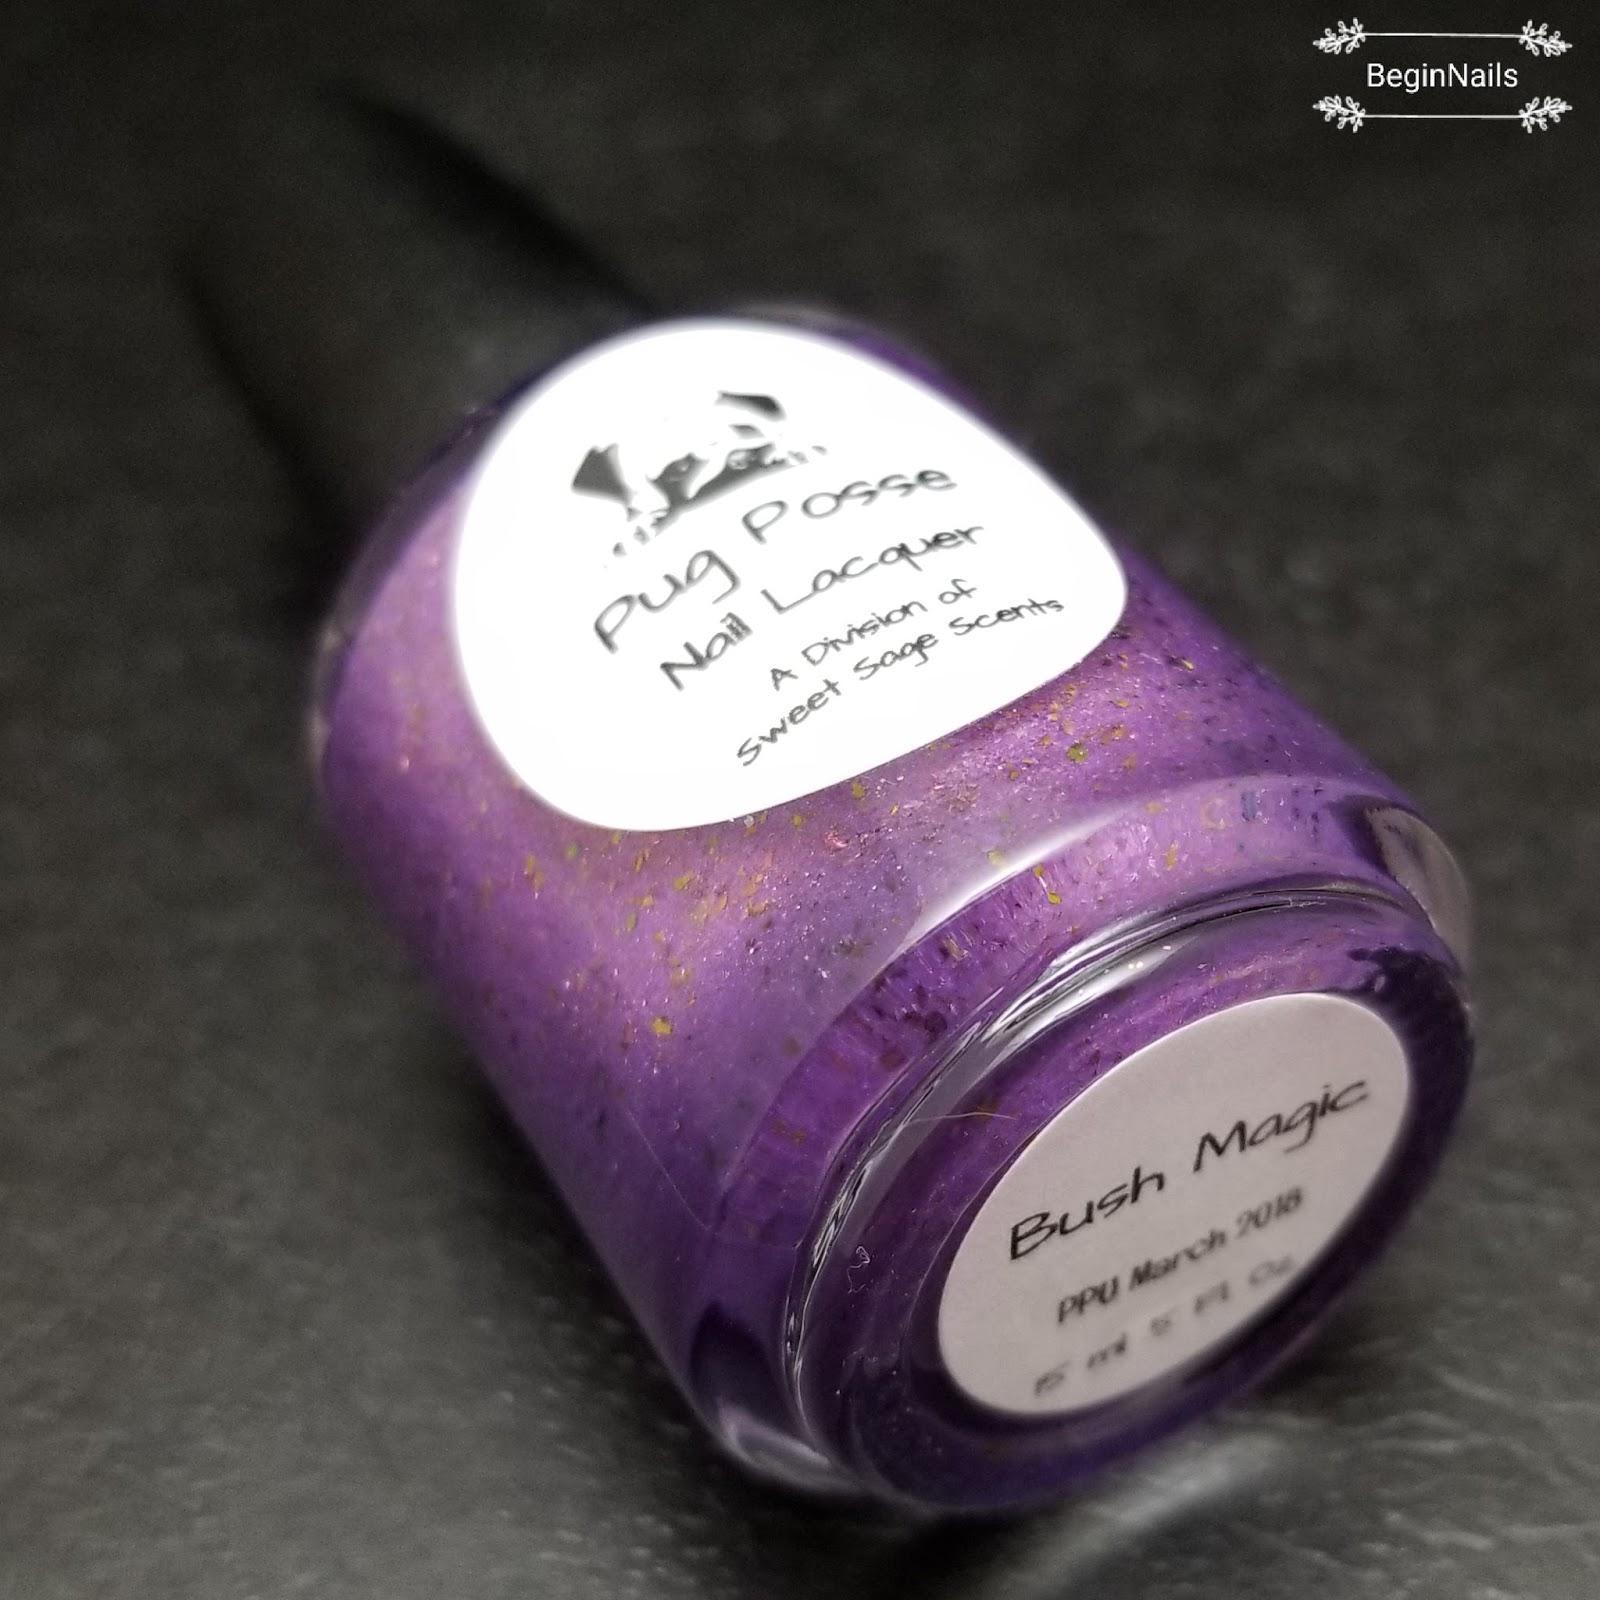 Let\'s Begin Nails: Polish Pick Up: Pug Posse Nail Lacquer - Bush Magic